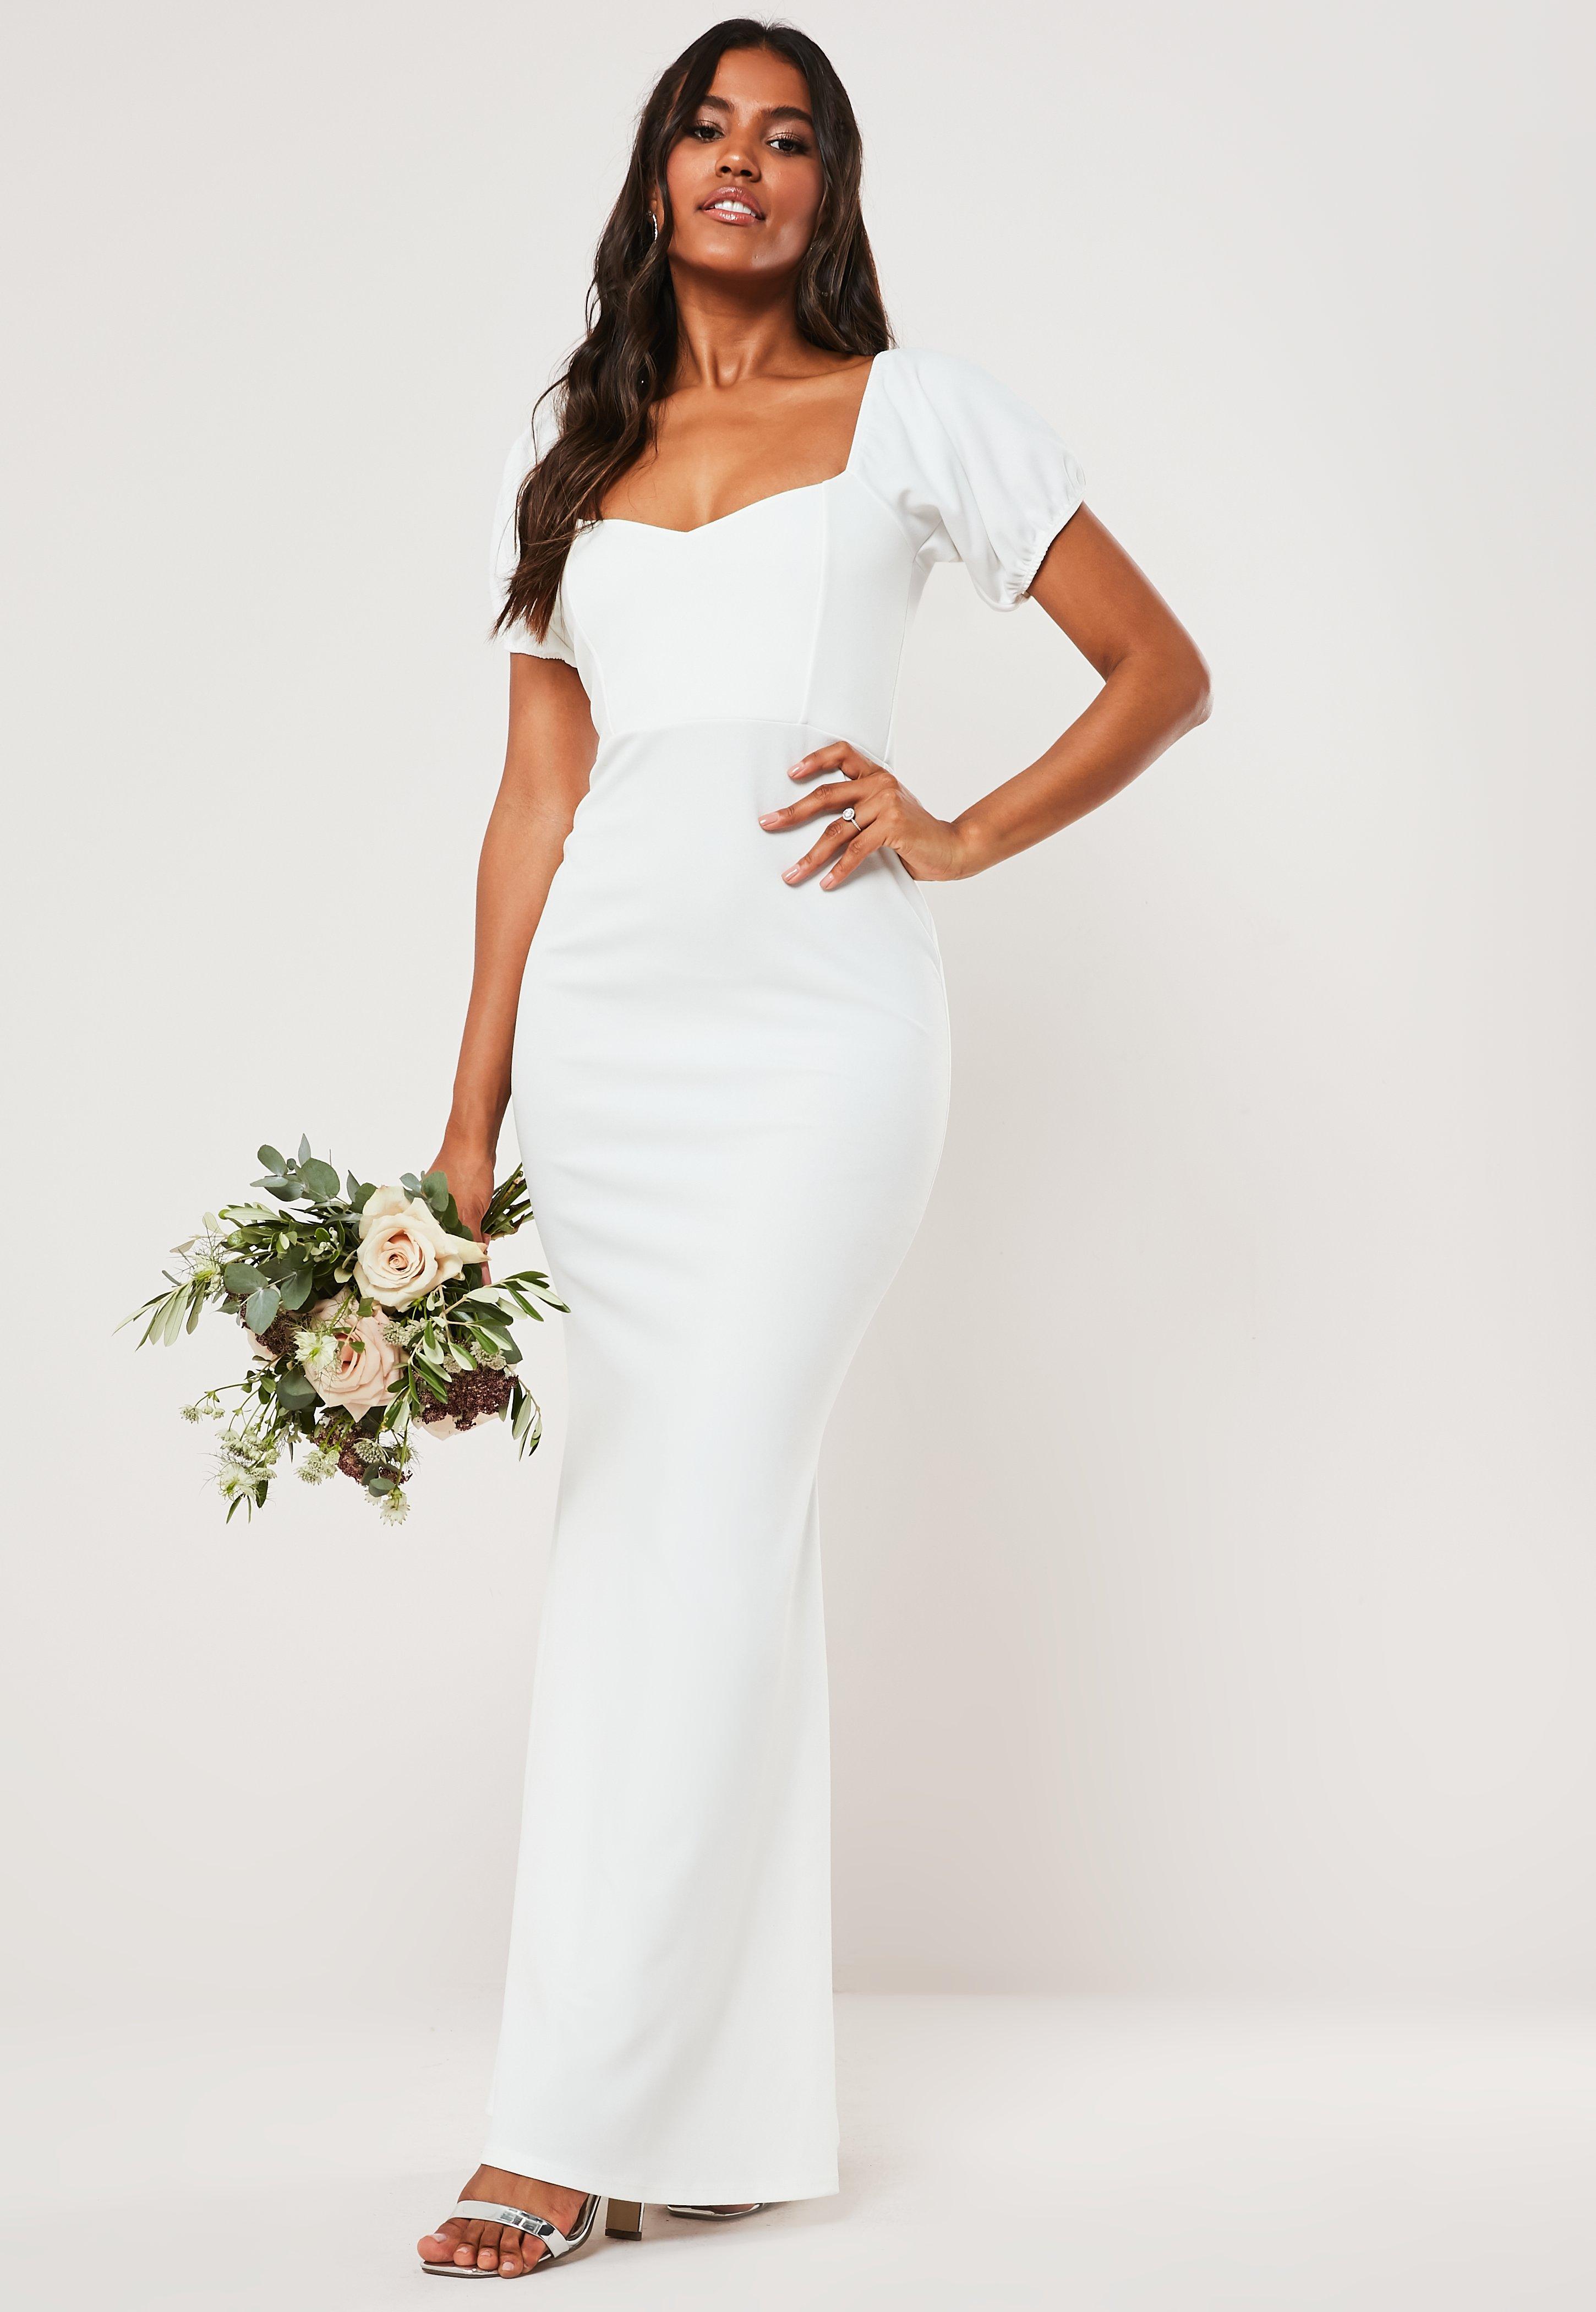 b26b70ba99 Bridesmaid White Sweetheart Puff Sleeve Maxi Dress